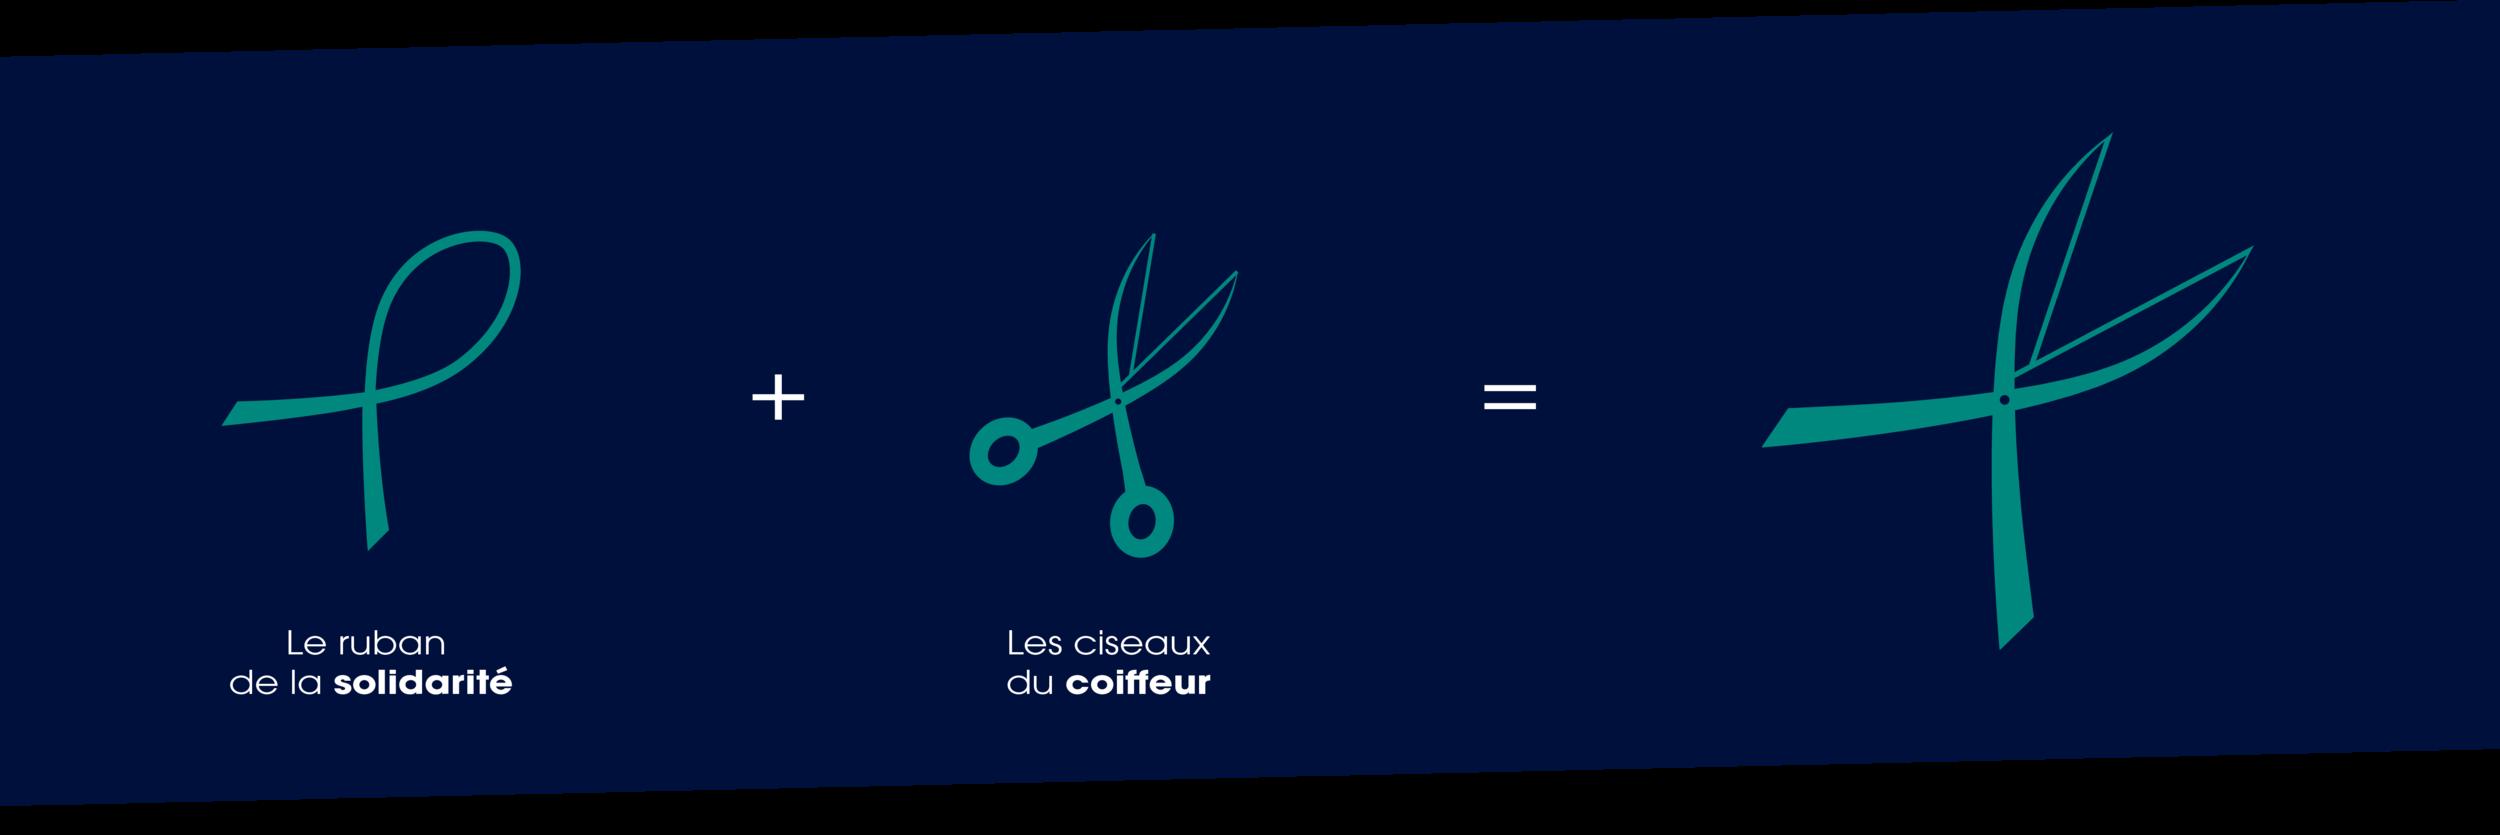 Explication logo_Plan de travail 1.png